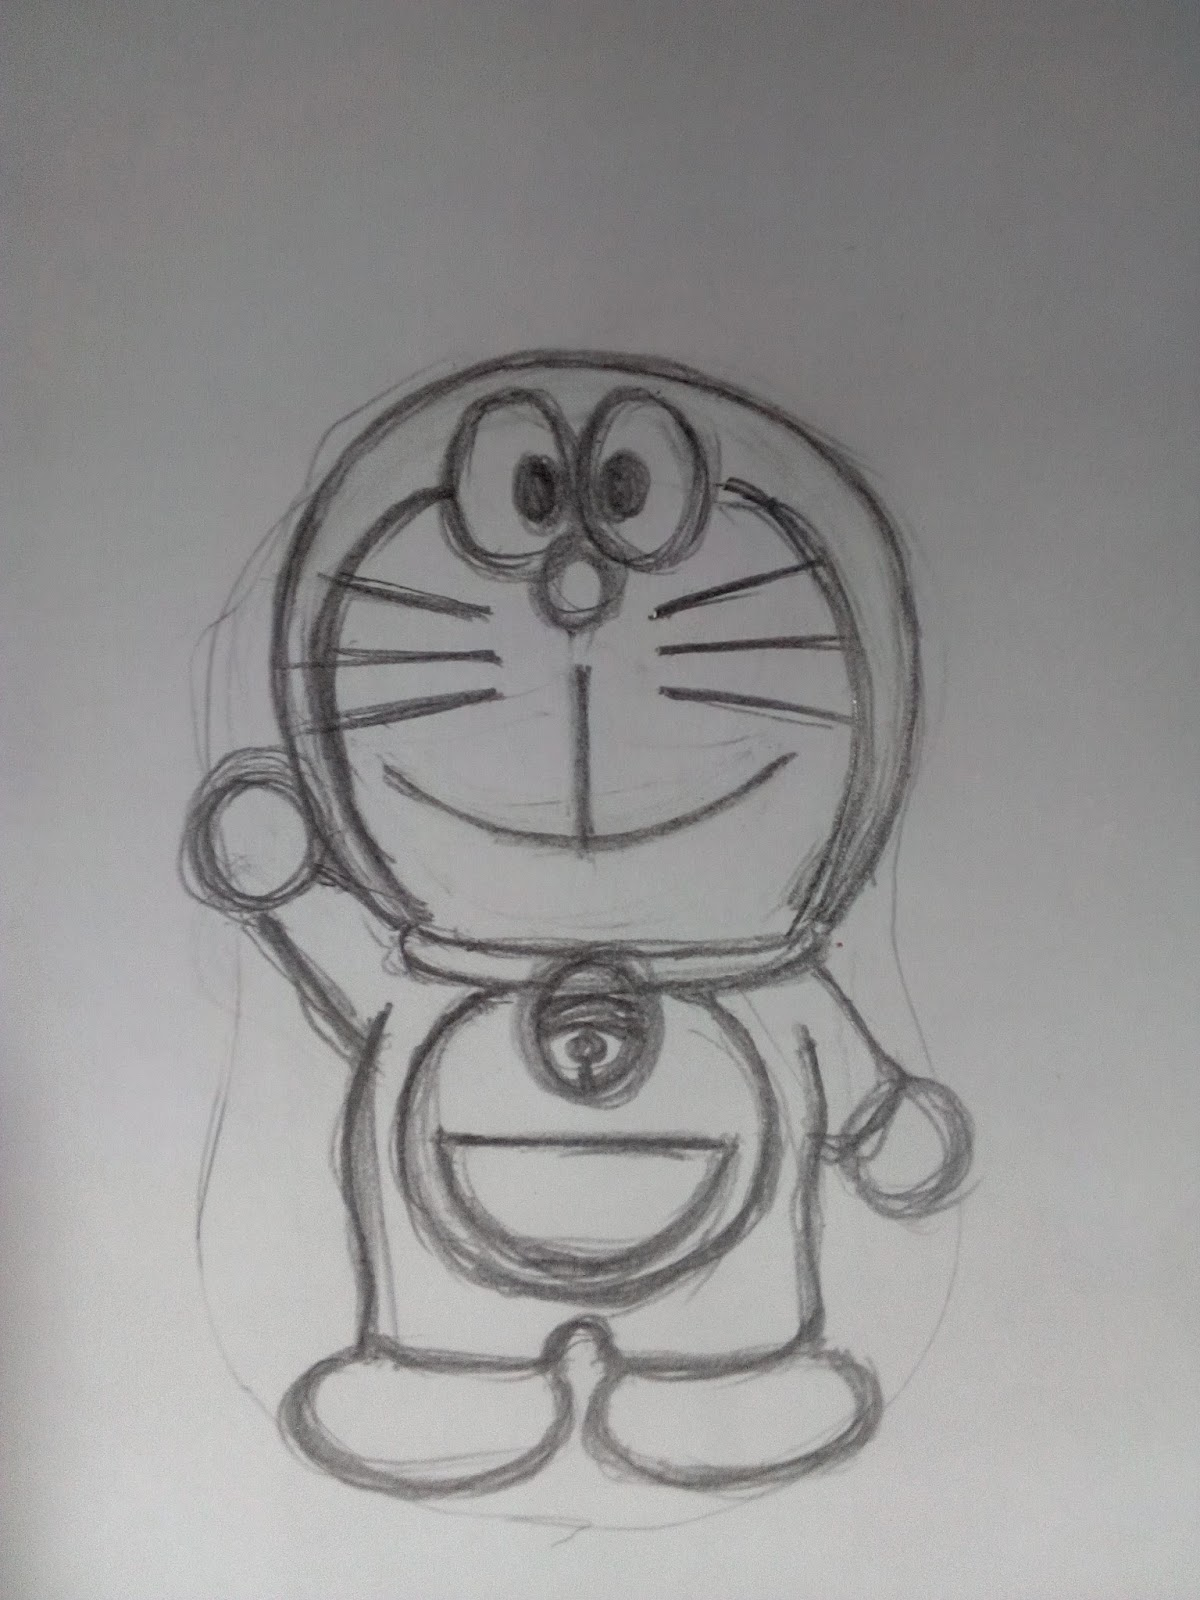 178 Gambar Sketsa Doraemon Berwarna